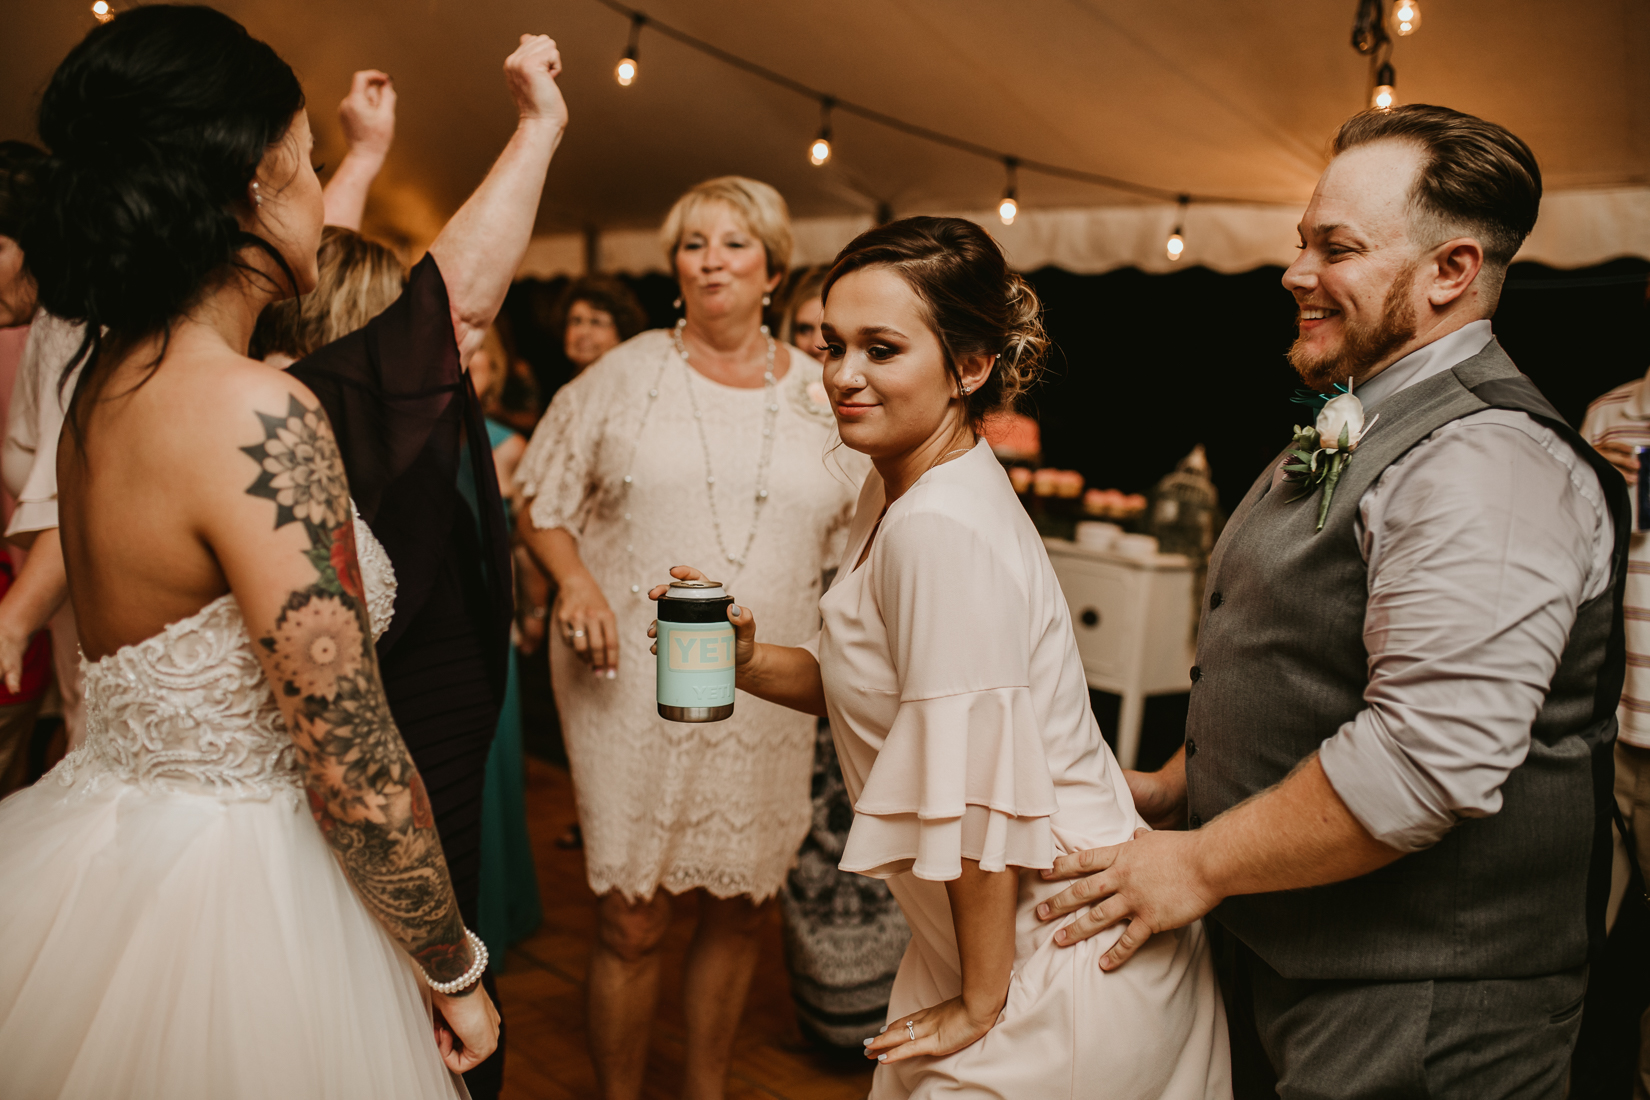 olivia_zay_wedding_09_2018-9162.jpg